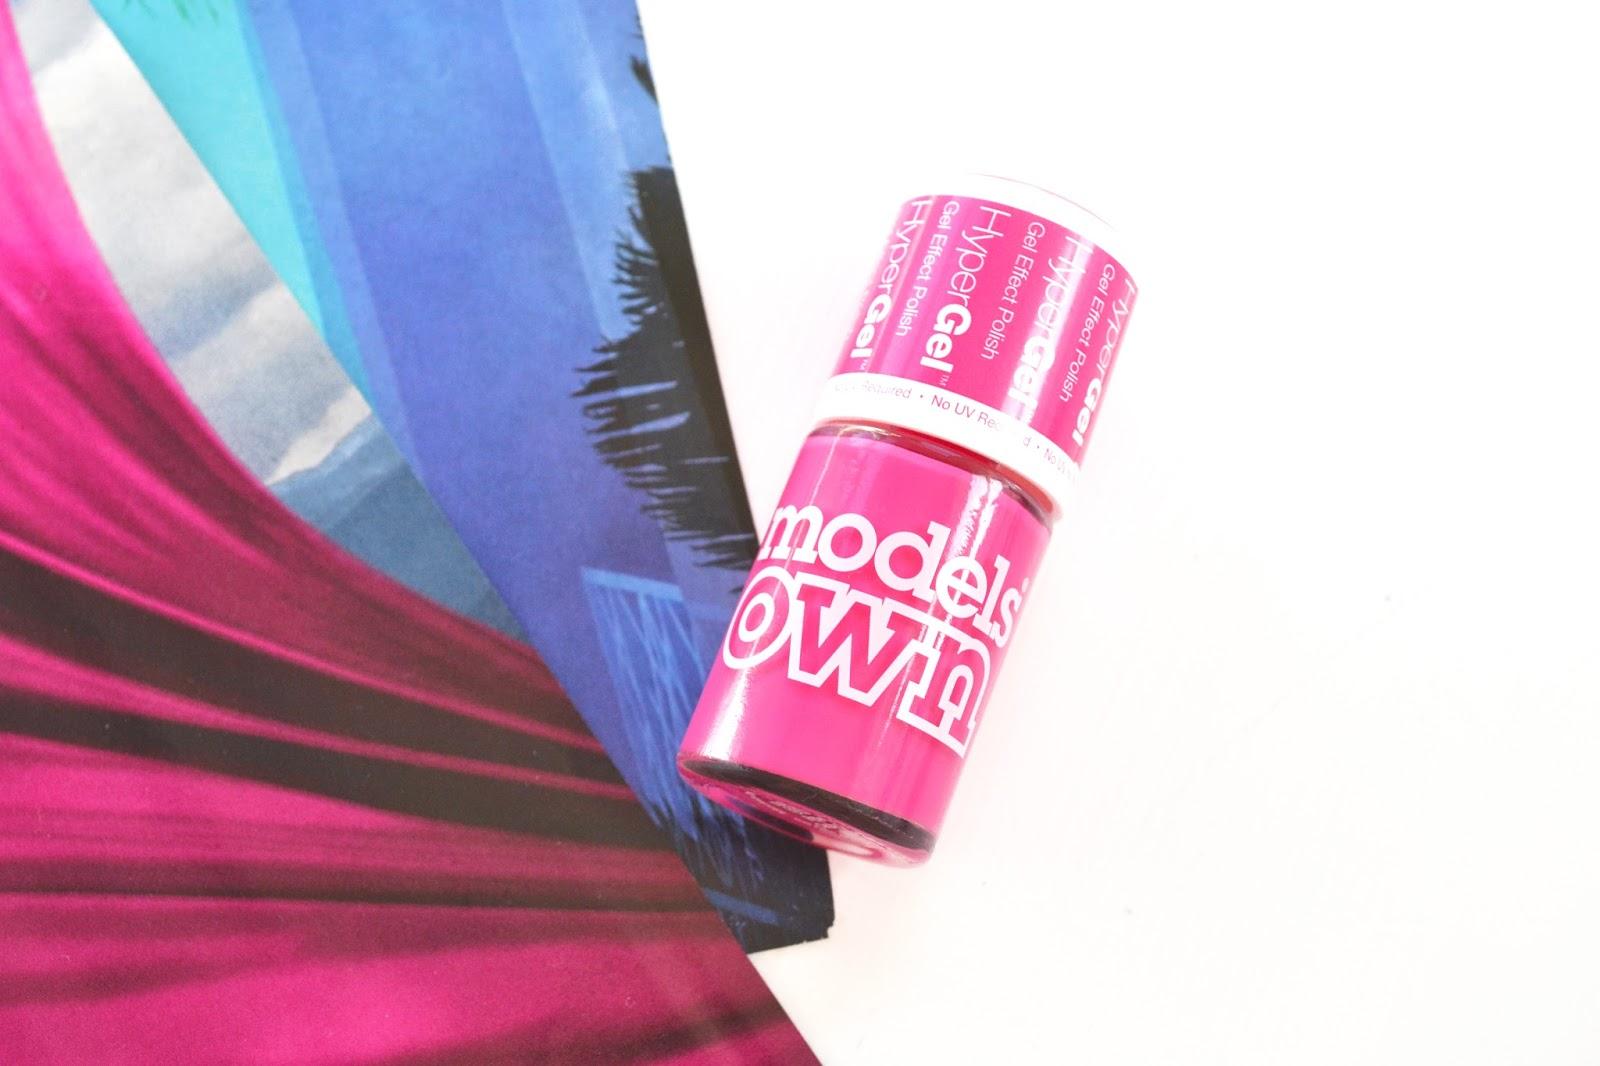 models own hypergel, models own cerise shine, bright pink nail polish, pink gel nail polish